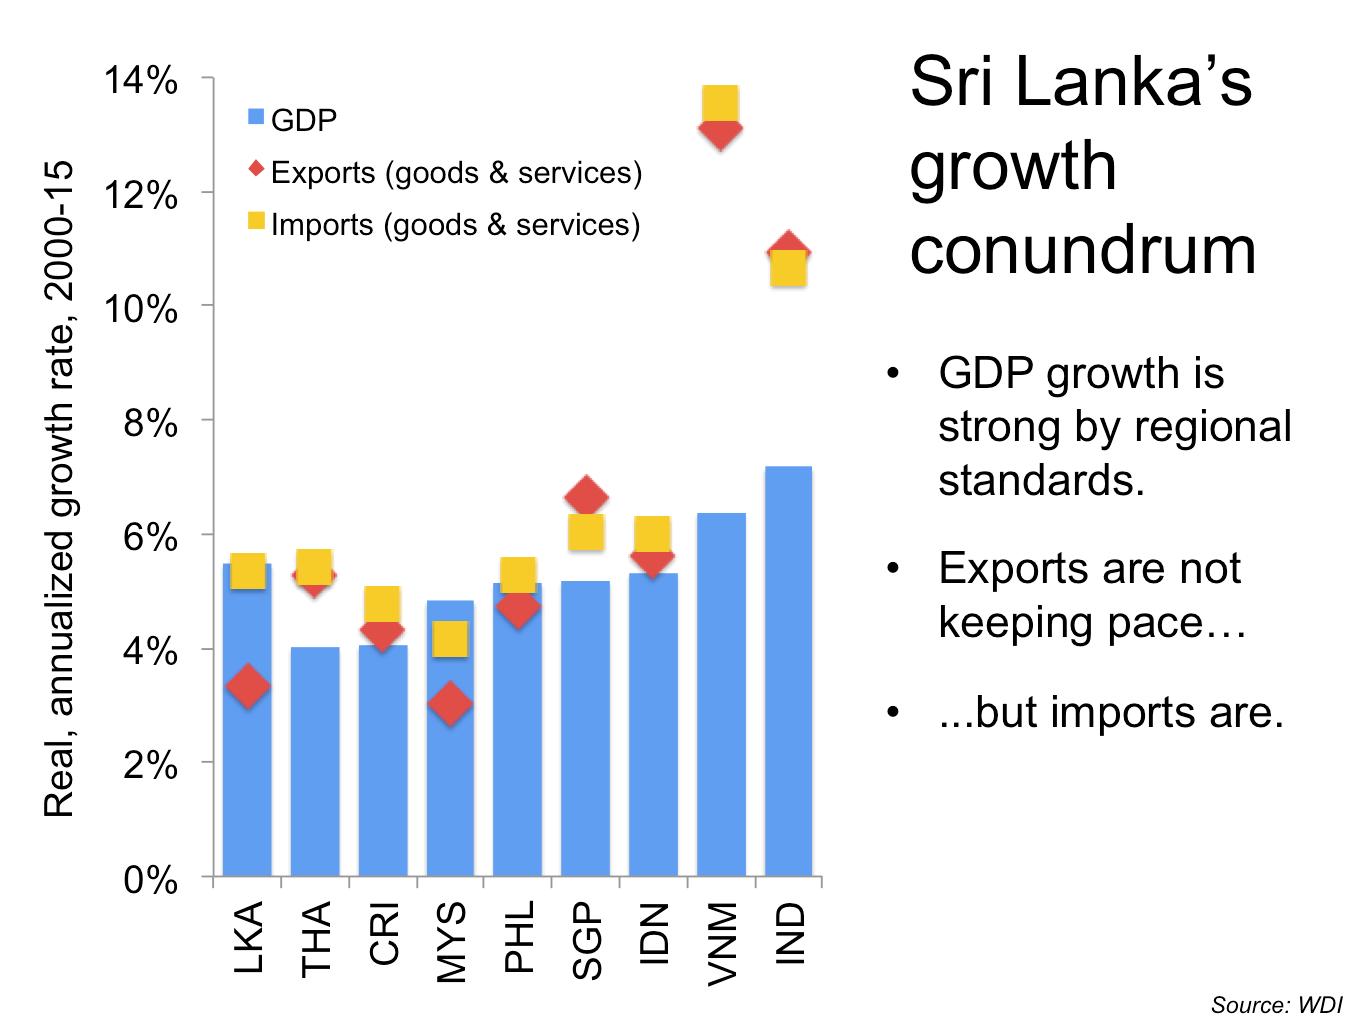 Sri Lanka Growth Conundrum